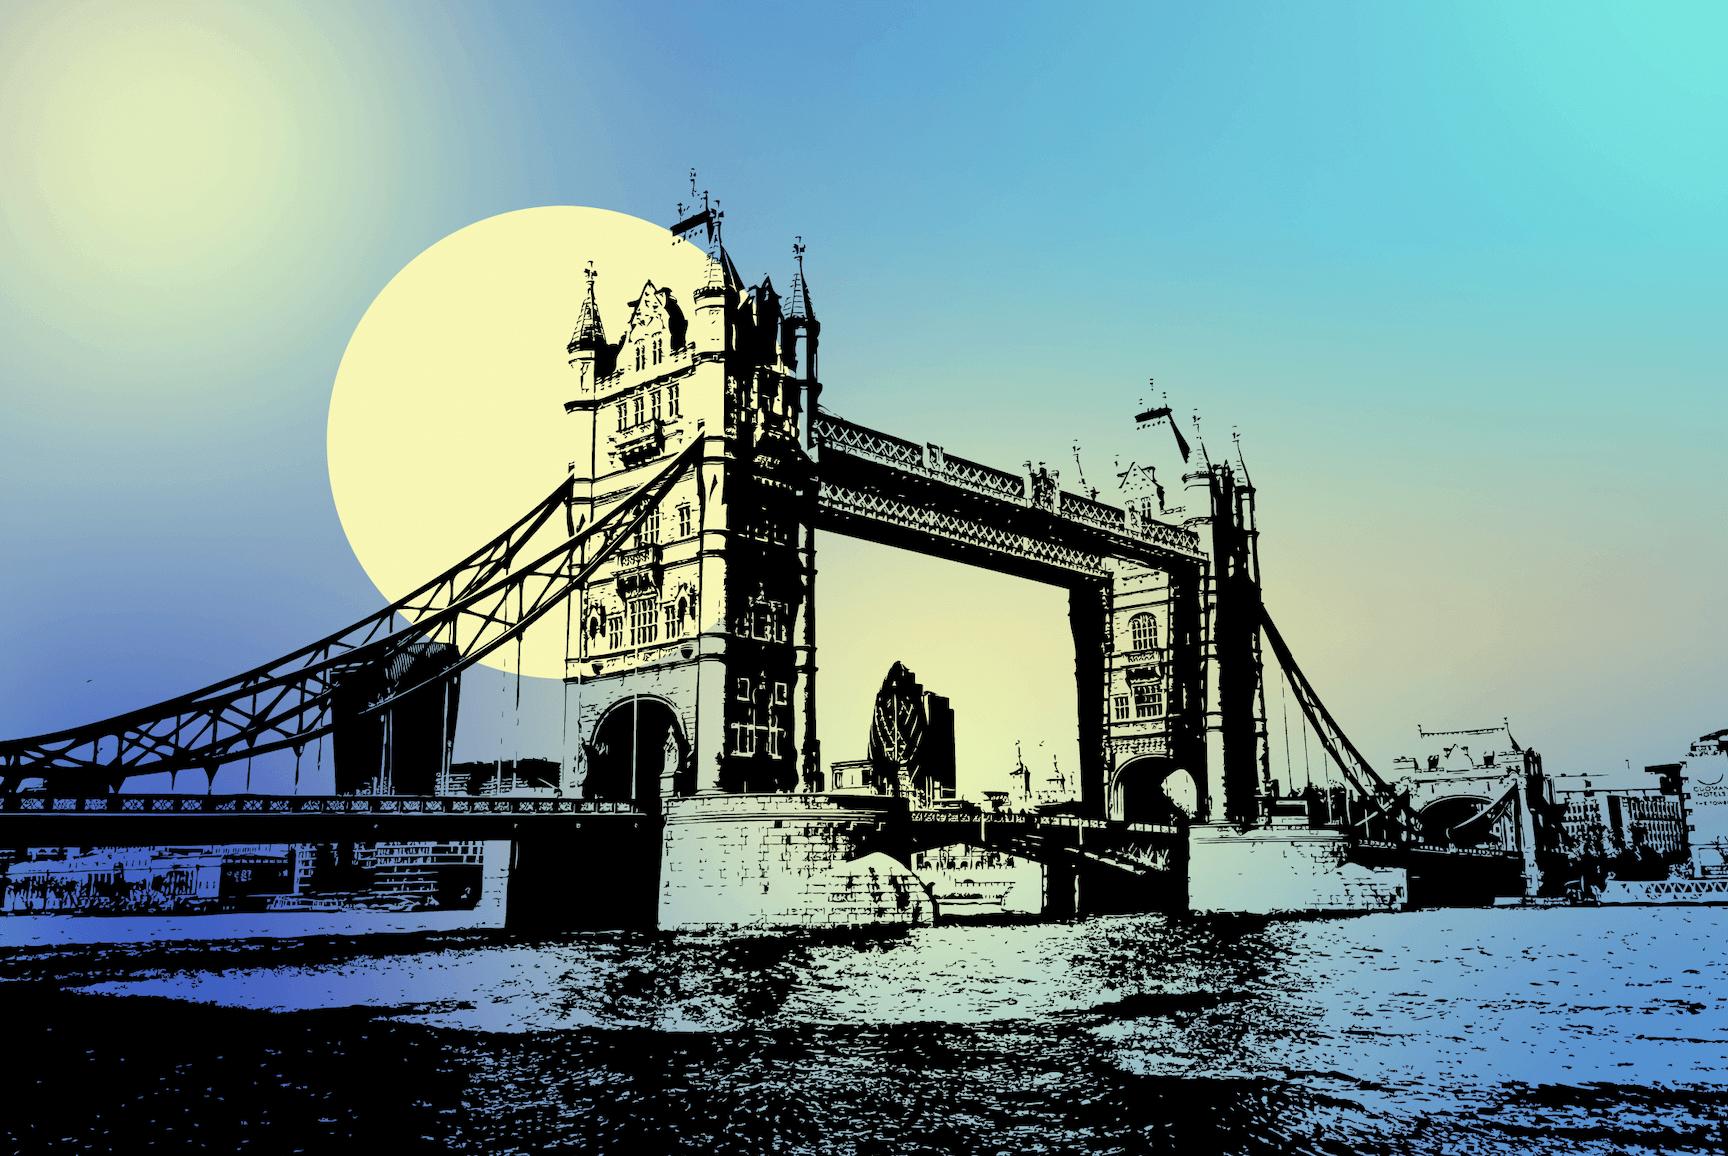 Tower Bridge by Amy Smith